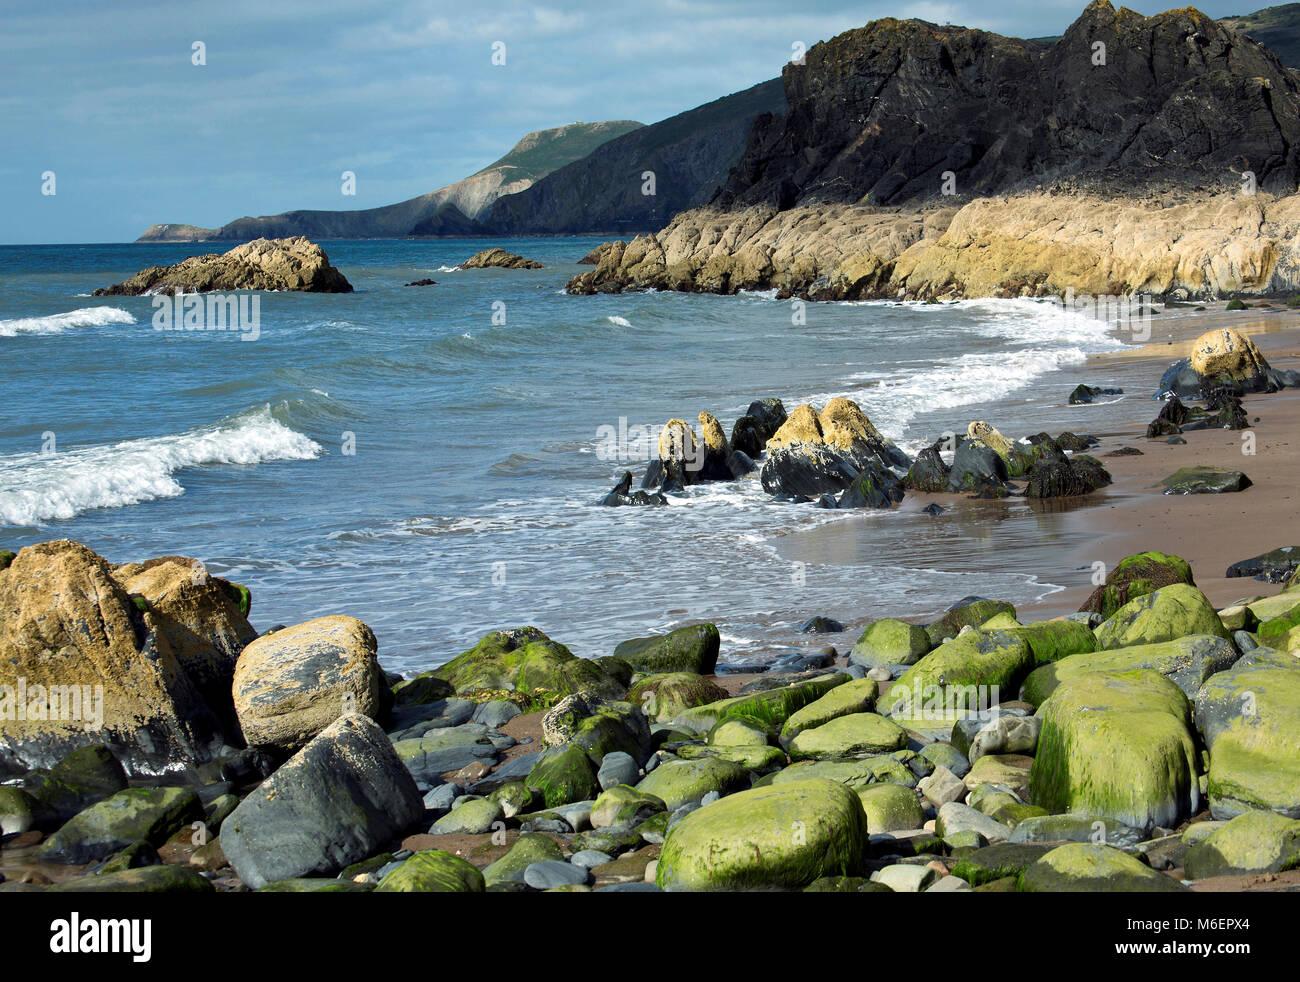 Seashore and coastline at the rock strewn part of Tresaith Beach in Cardigan Bay Wales - Stock Image